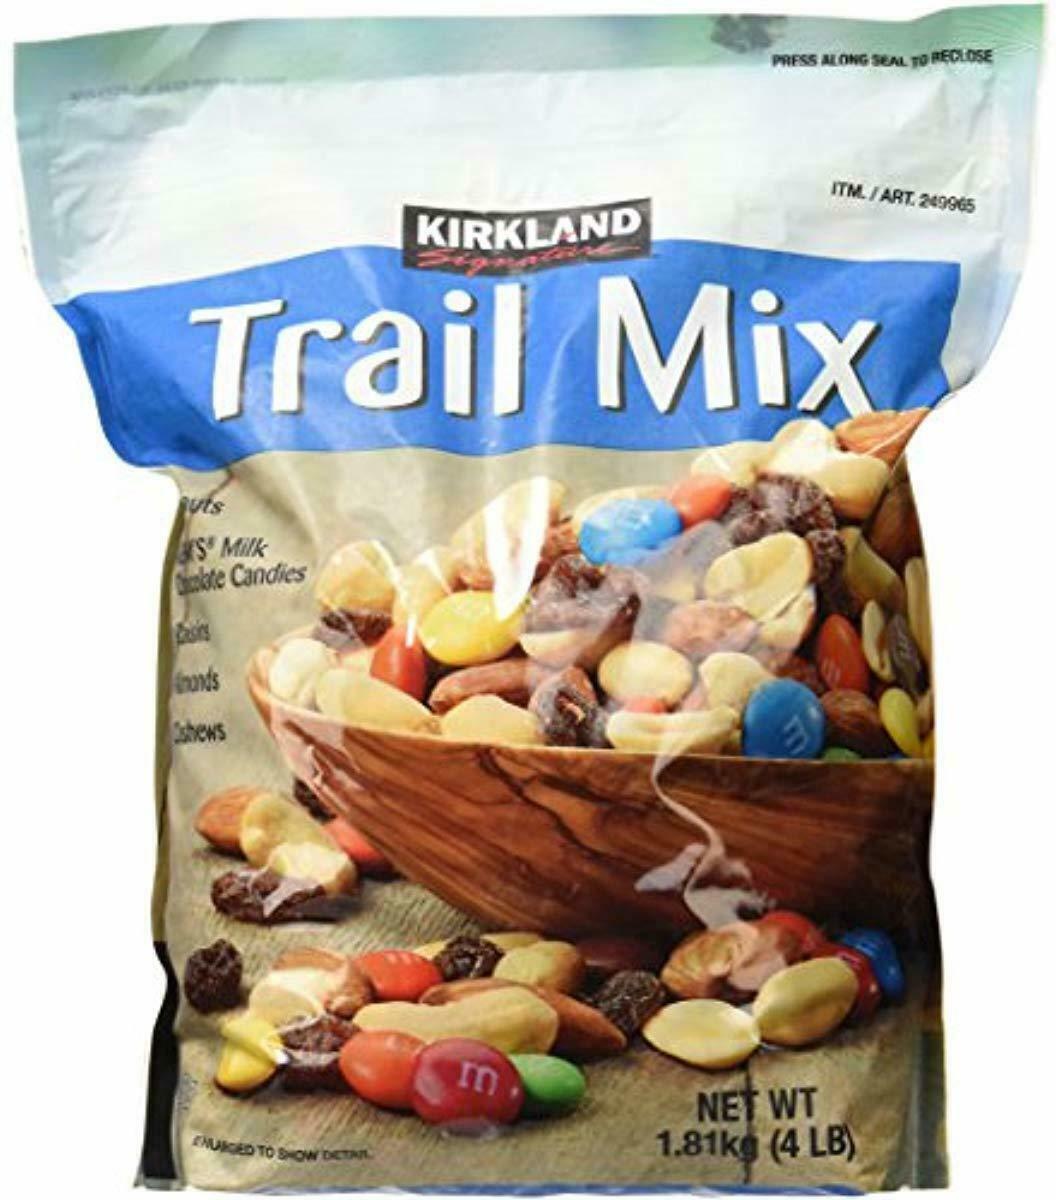 Kirkland Signature Signature Trail Mix, Peanuts, M and M Candies, Raisins, Almon - $42.26